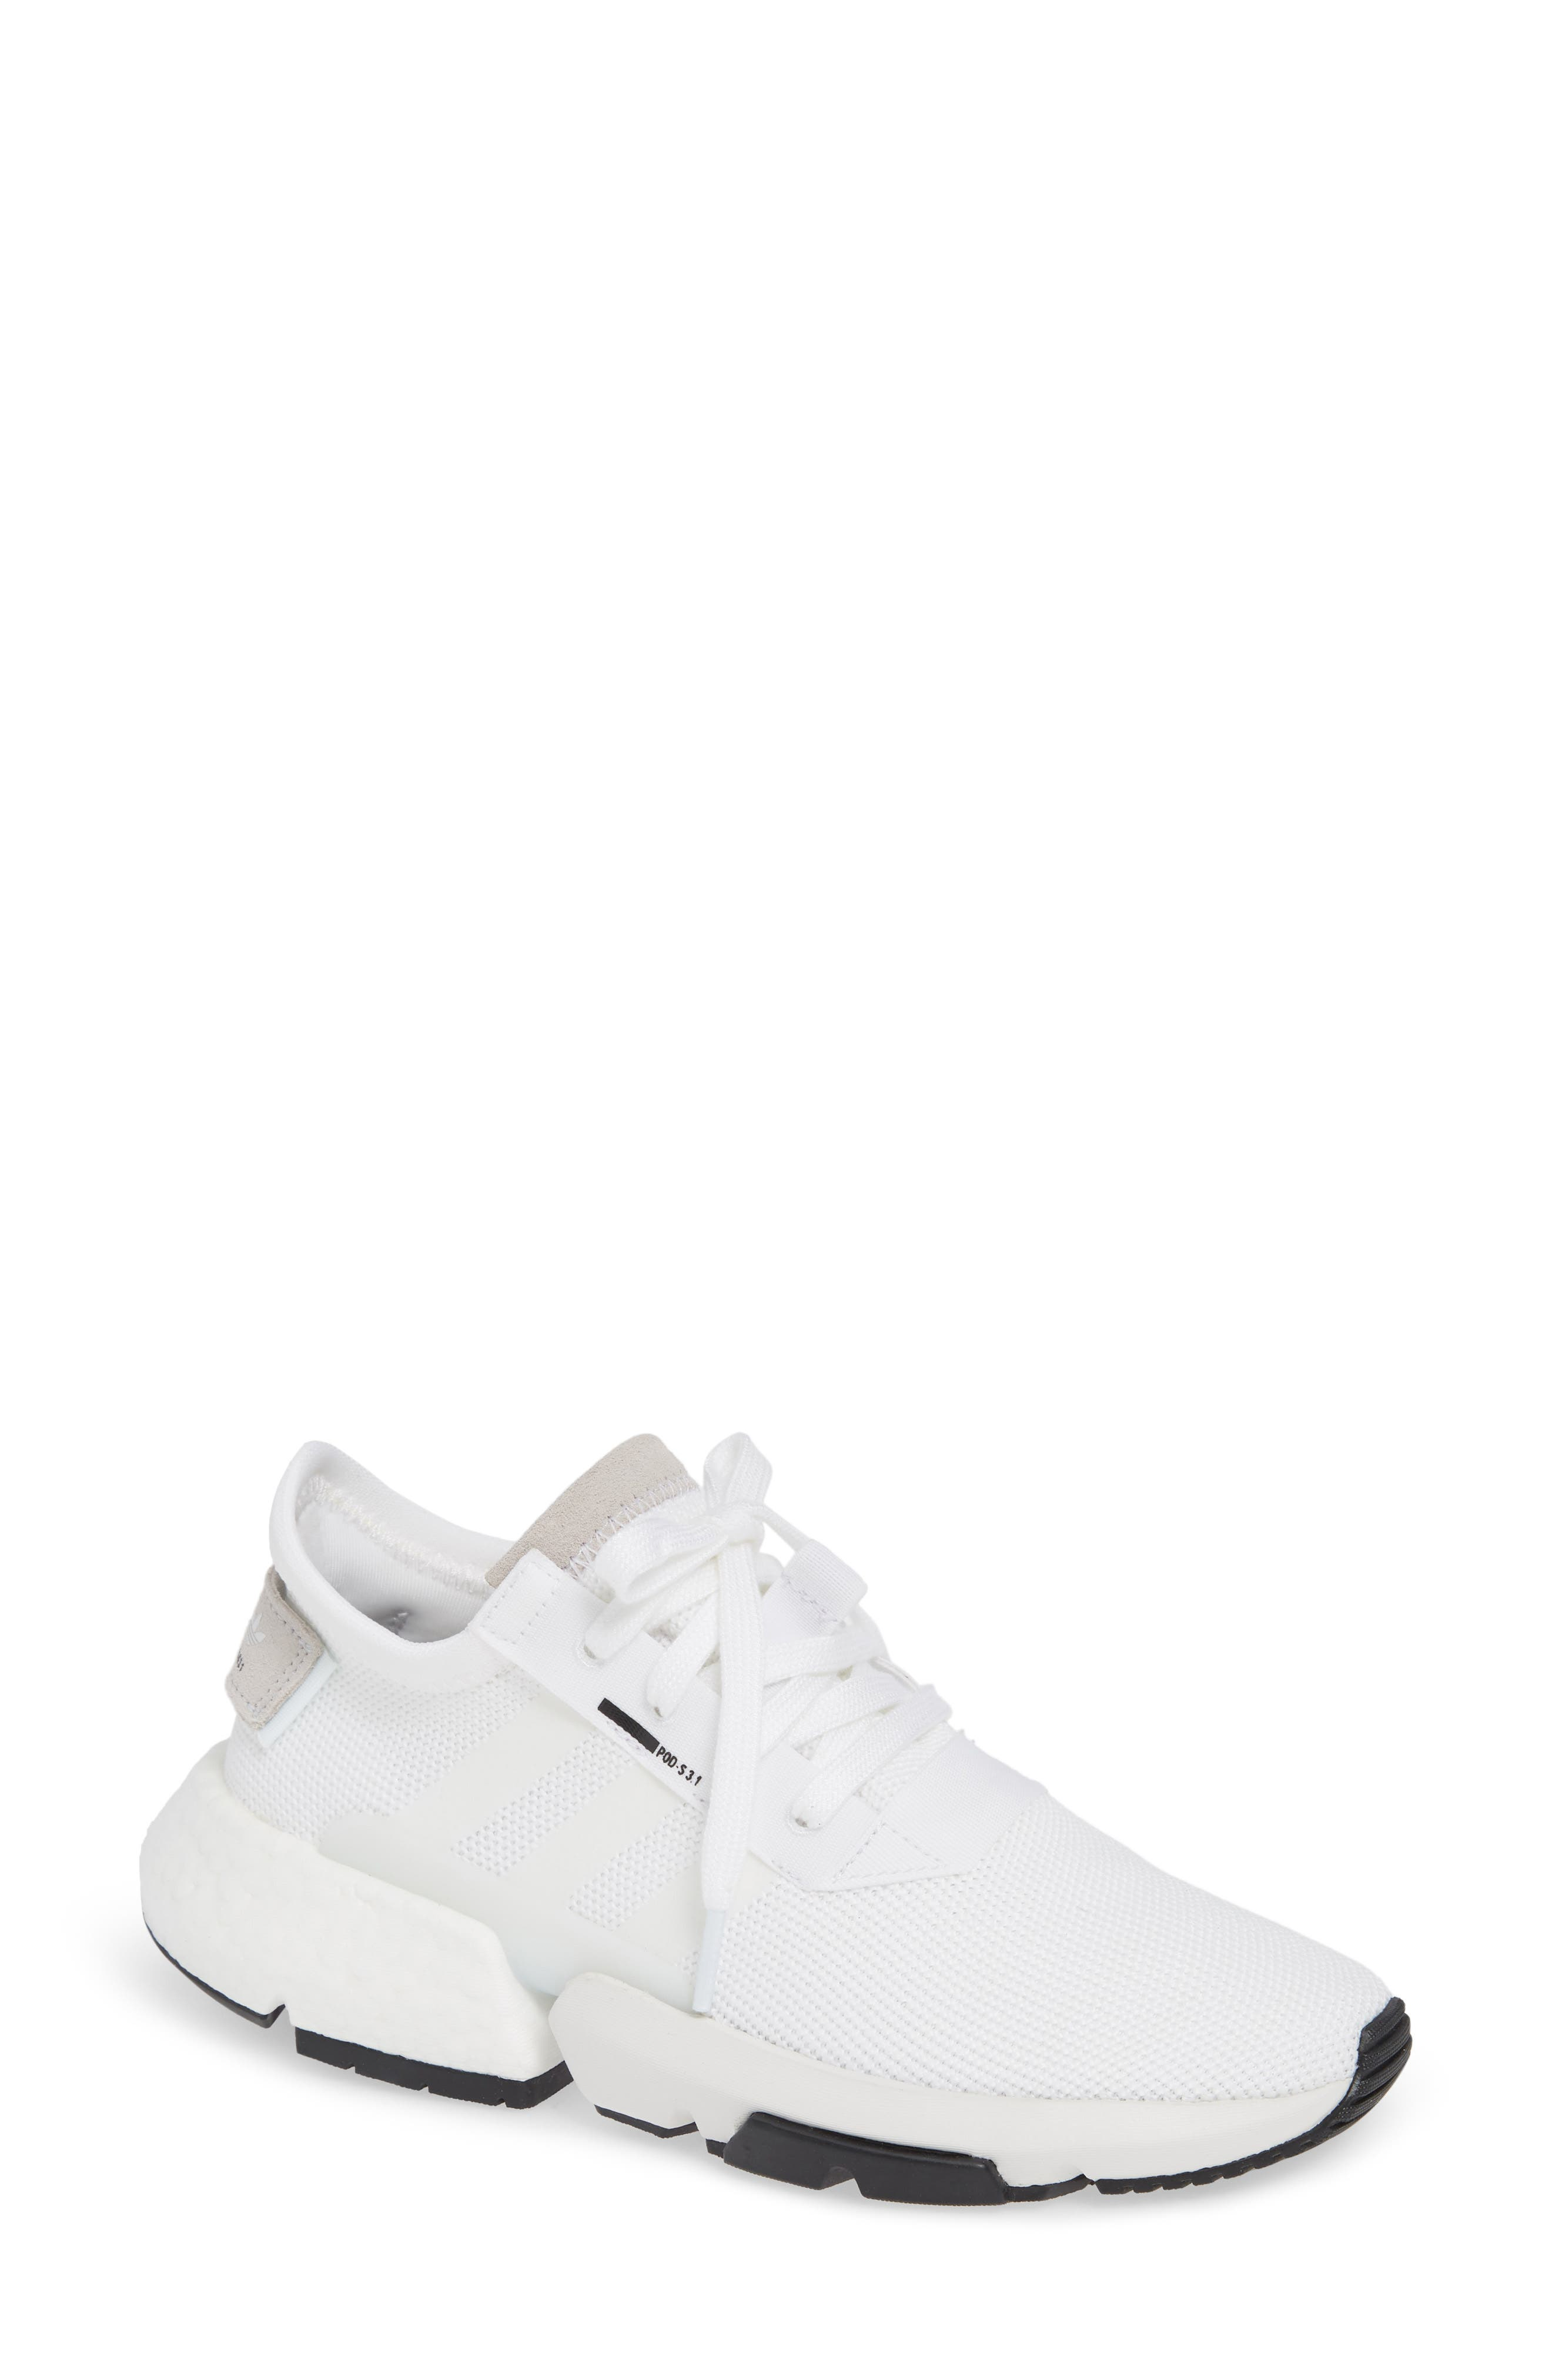 Pod S3.1 Sneaker,                             Main thumbnail 1, color,                             WHITE/ WHITE/ CORE BLACK